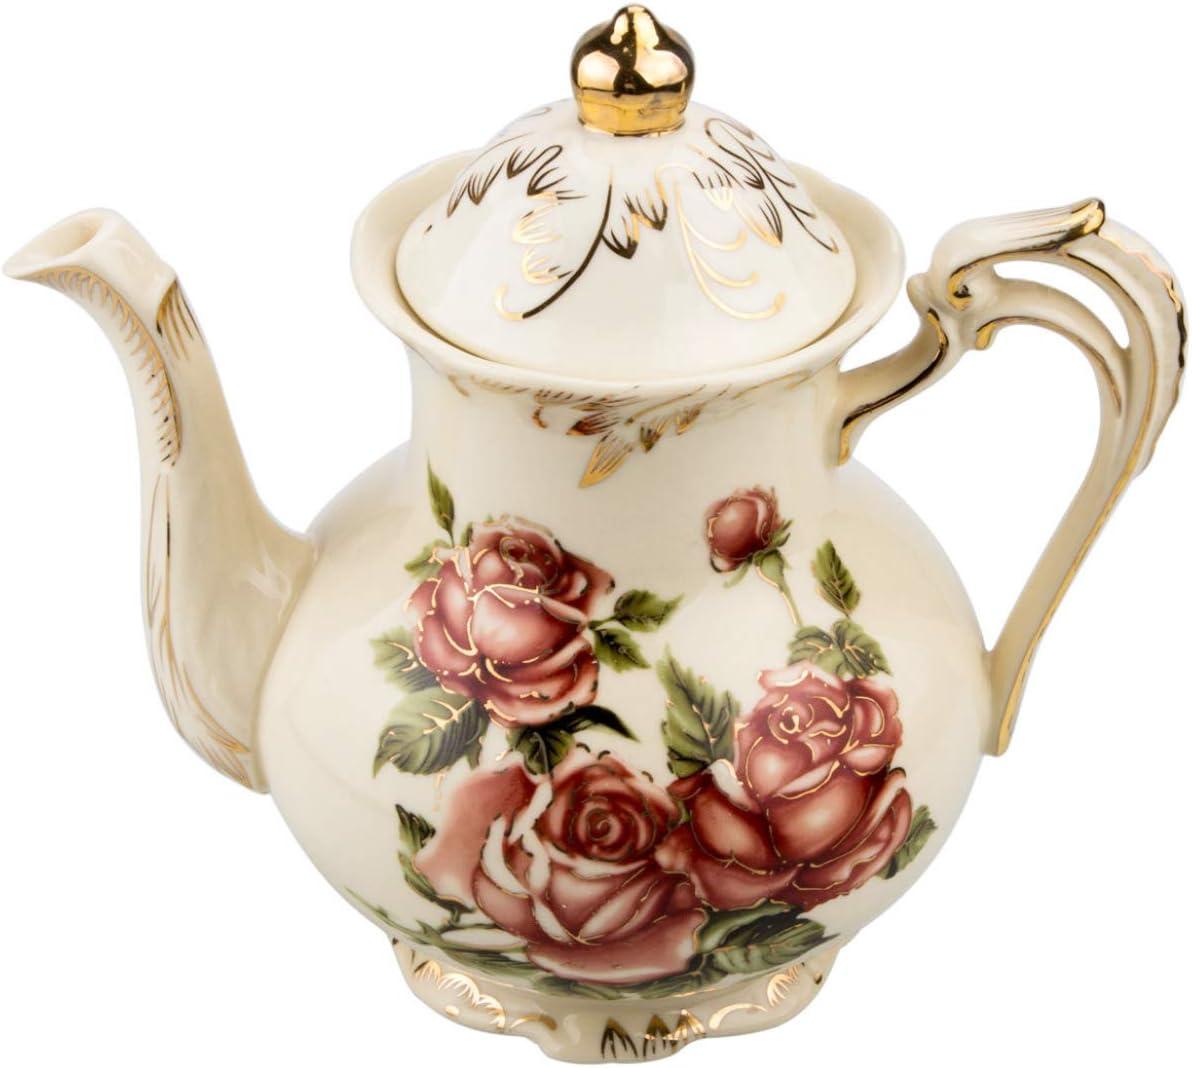 vintage teapot floral teapot vintage coffee pot coffee pot tea retro kitchen servingware kitchenware coffee teapot kitchen decor